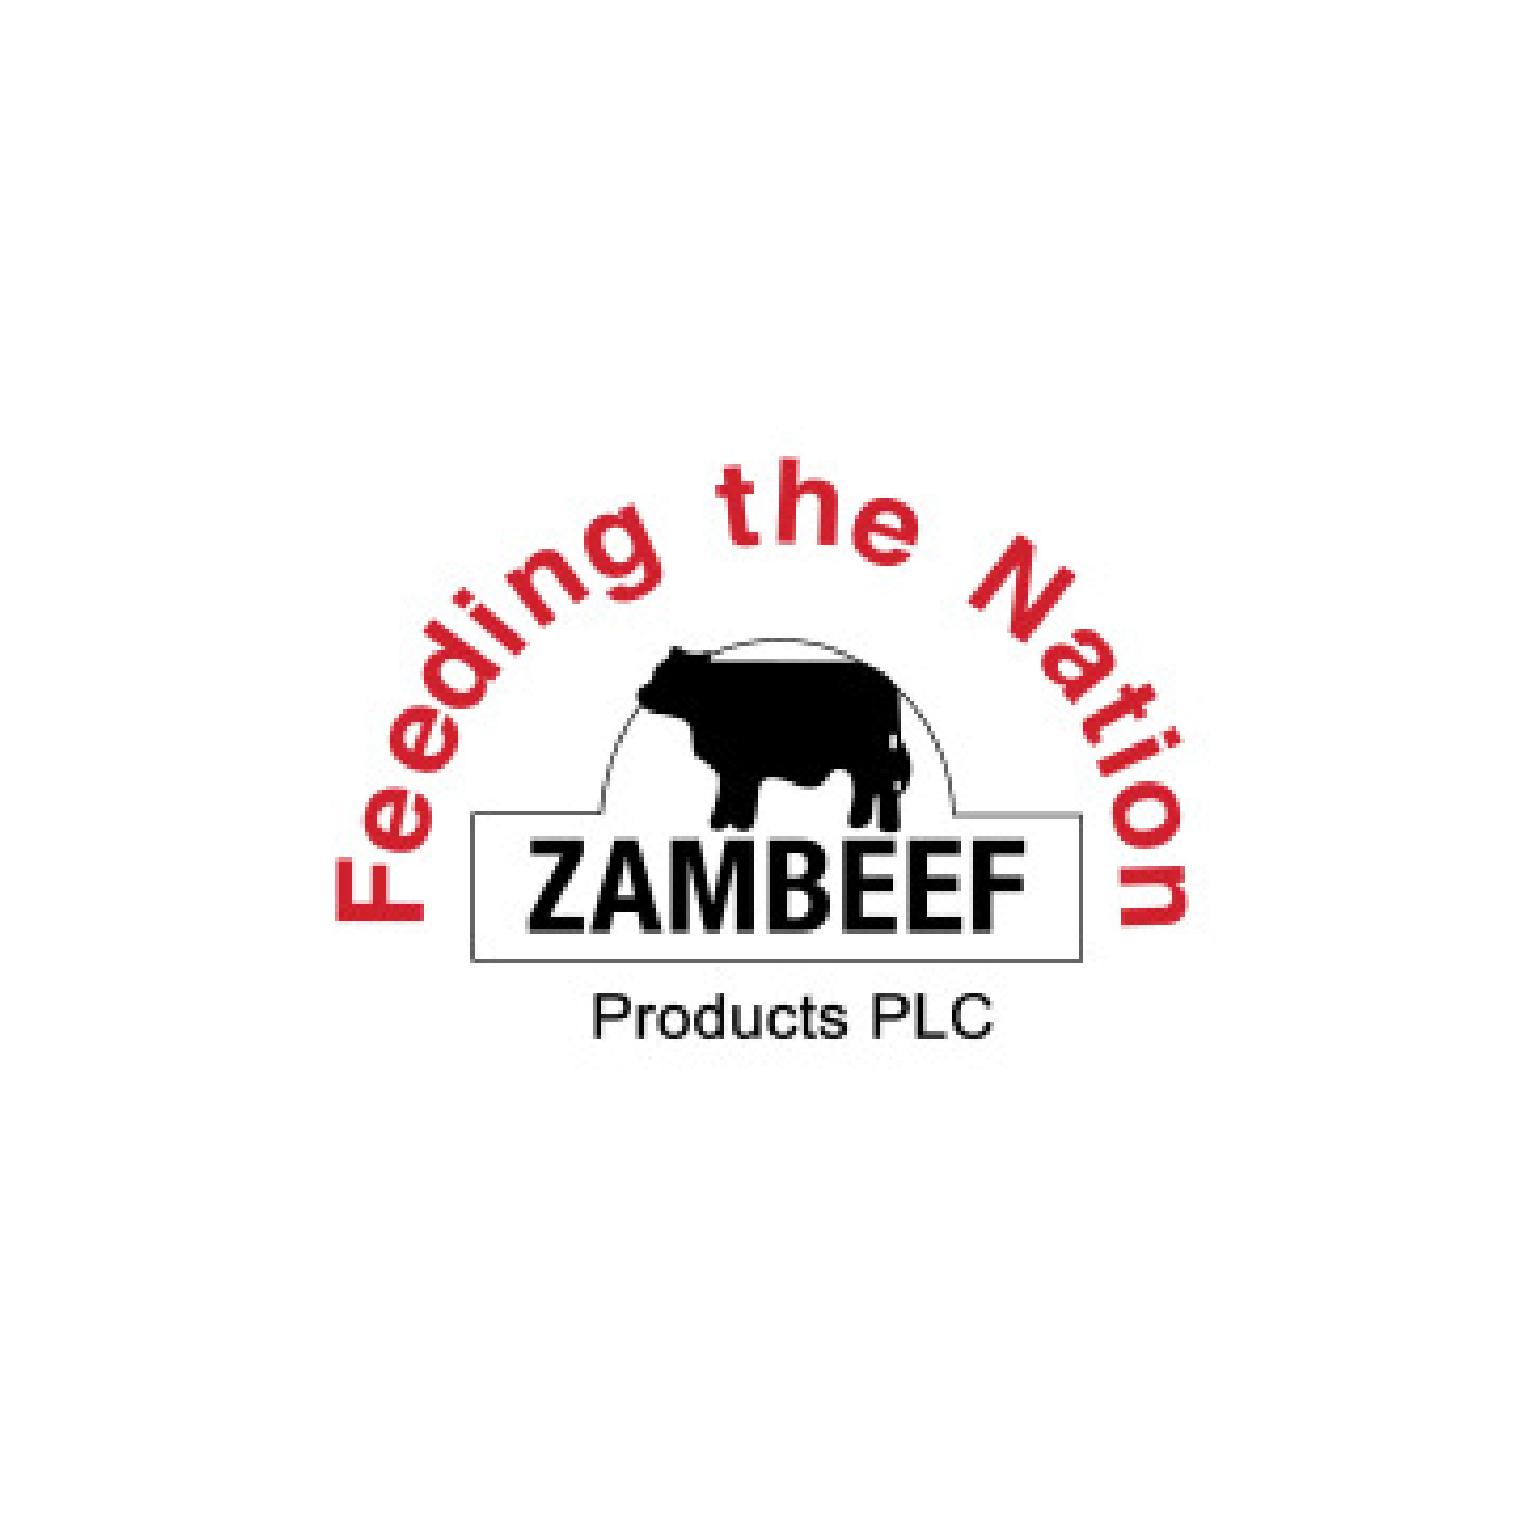 Zambeef